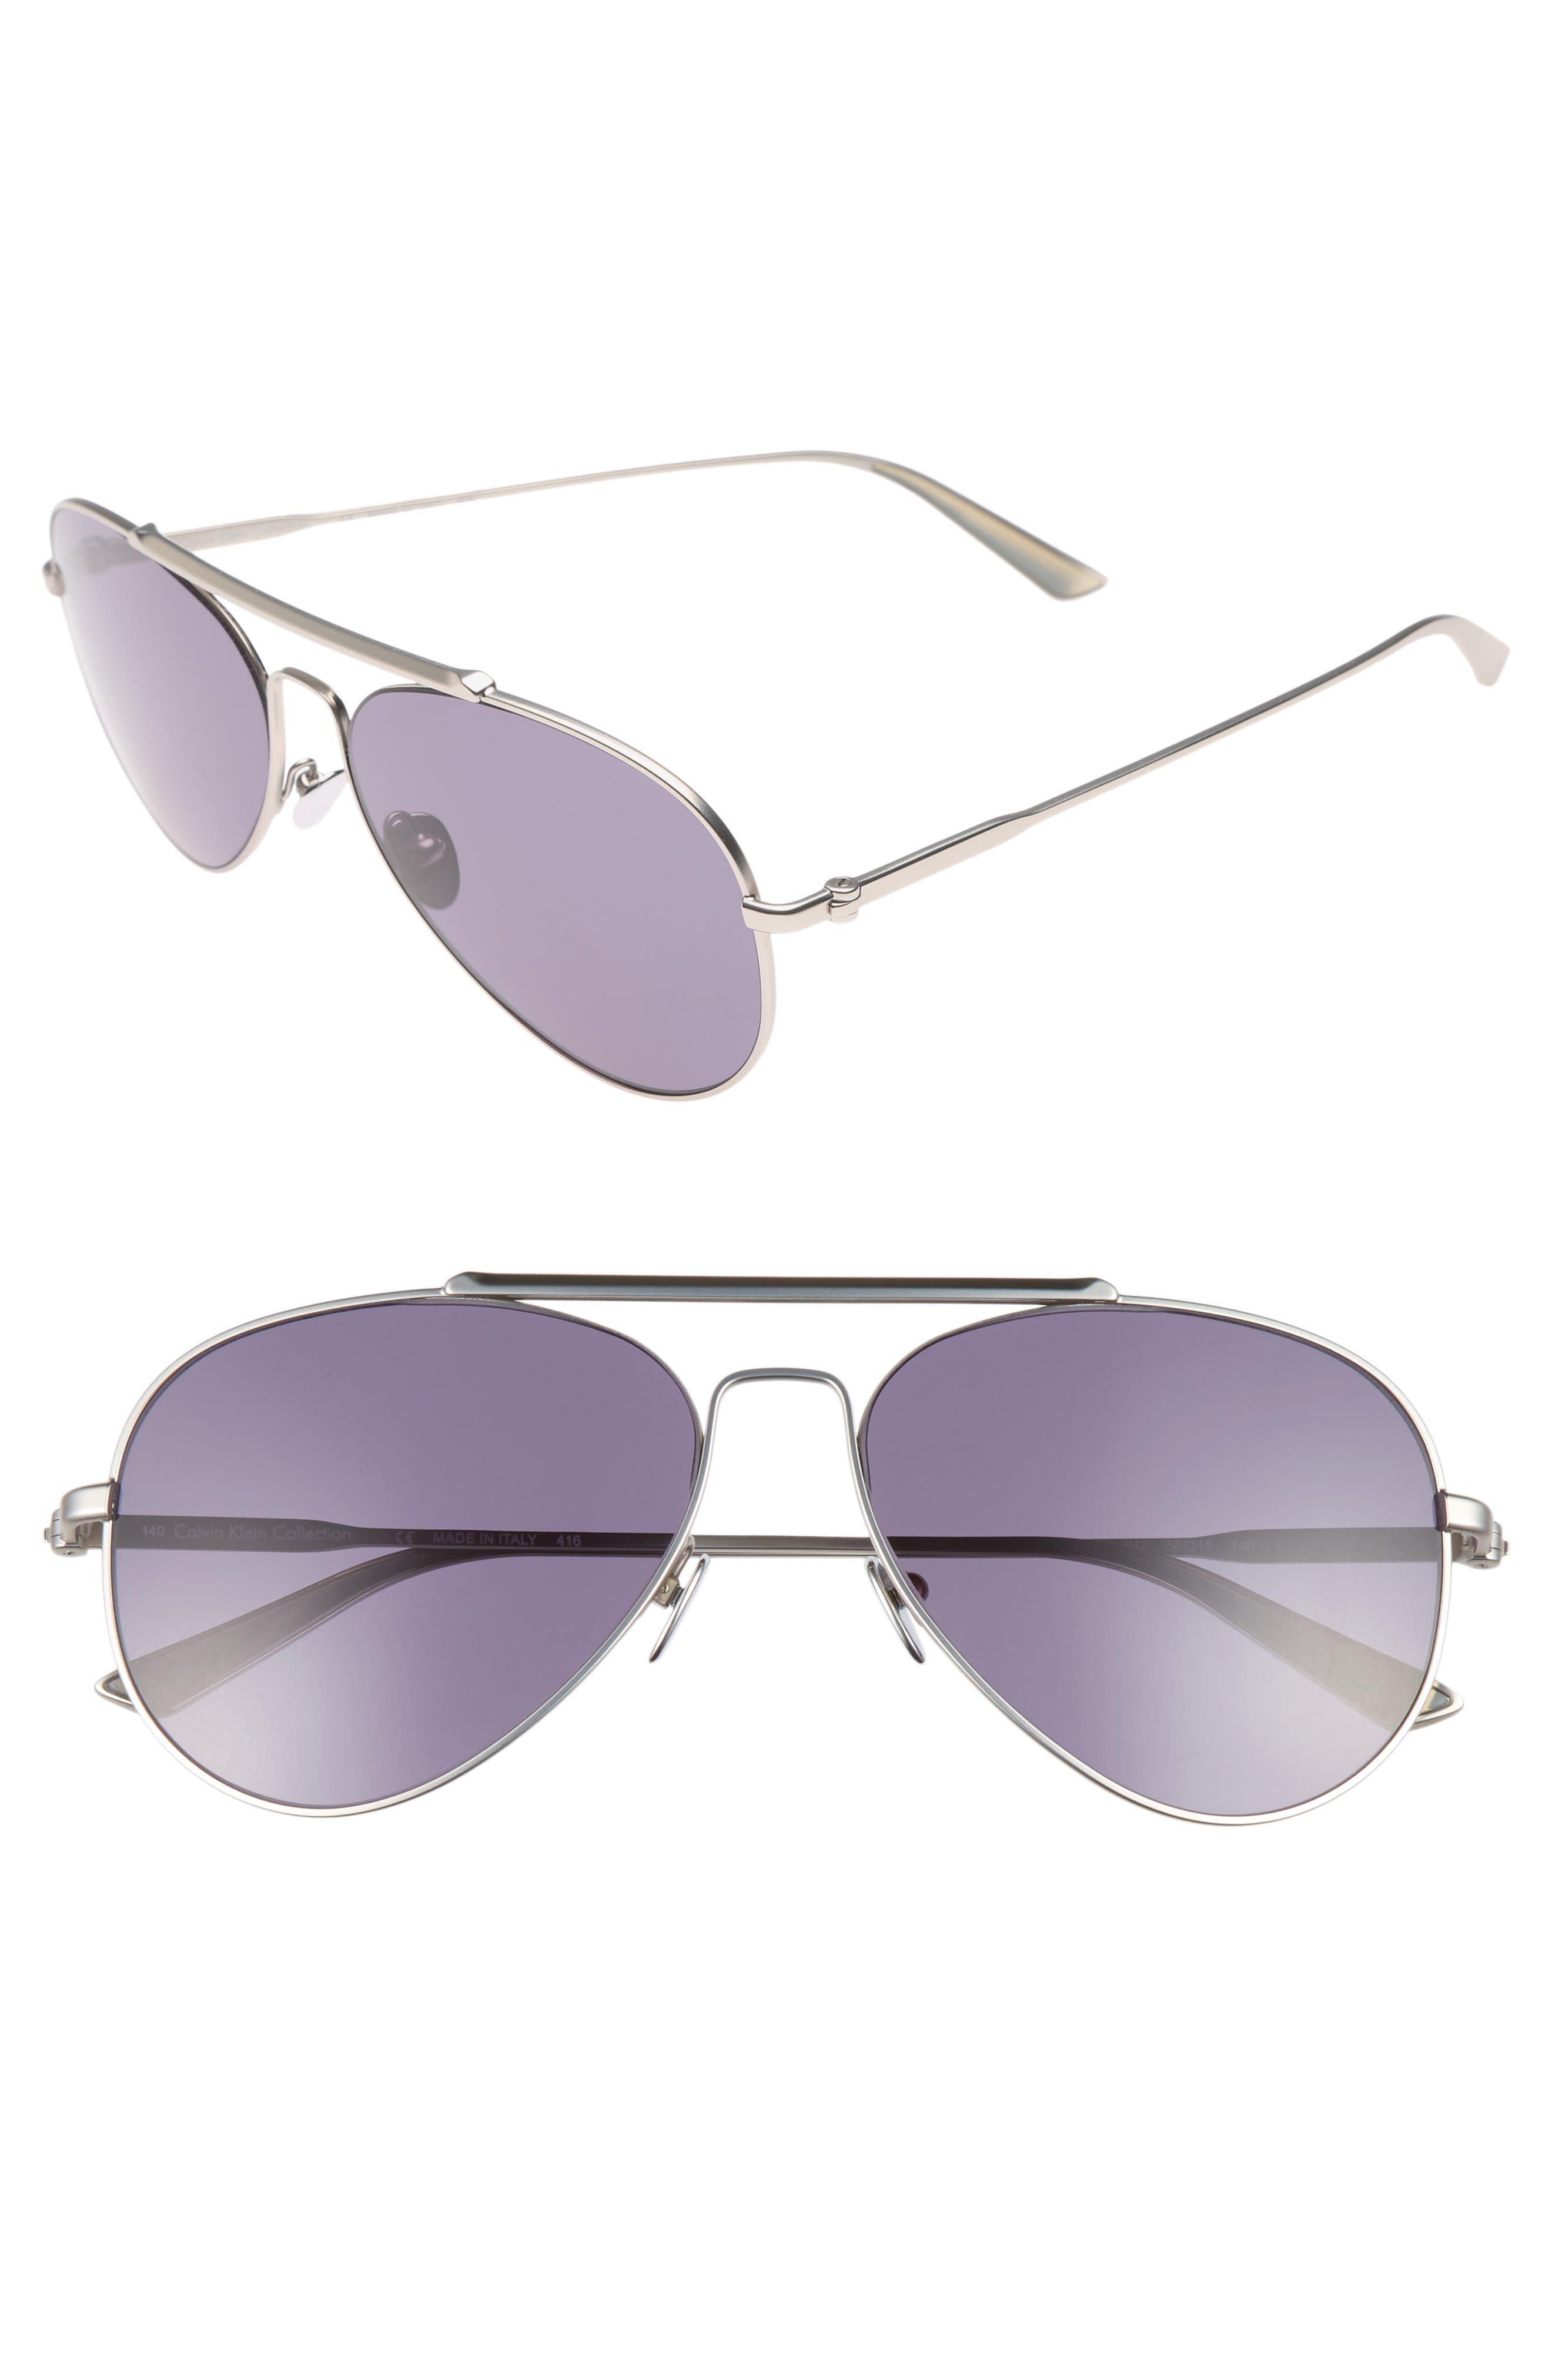 58mm Aviator Sunglasses,                         Main,                         color, 040